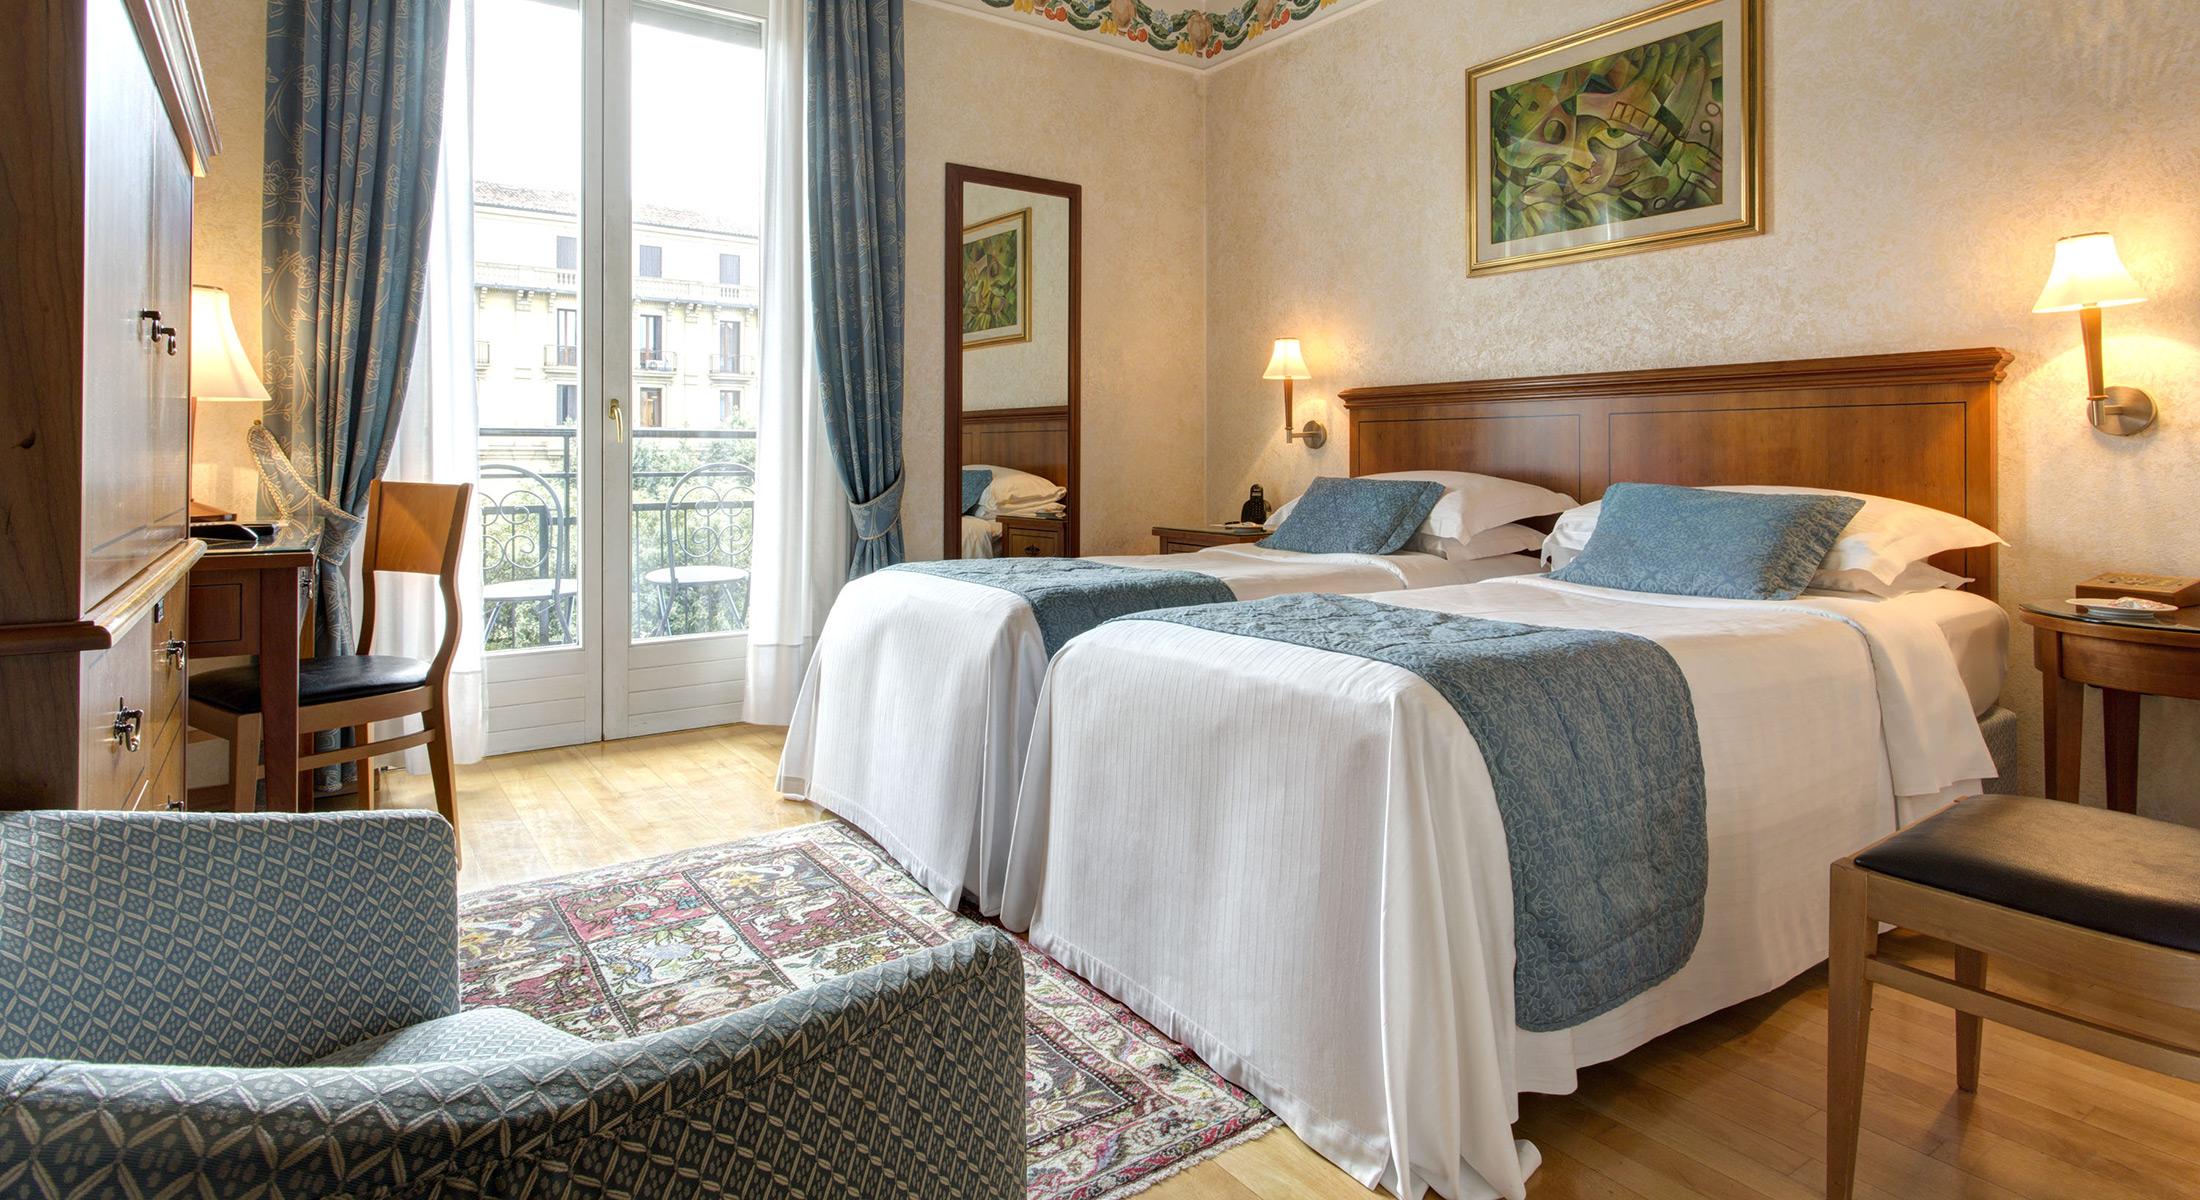 Zimmer Hotel Verona - Hotel Firenze Best Western In Verona ...